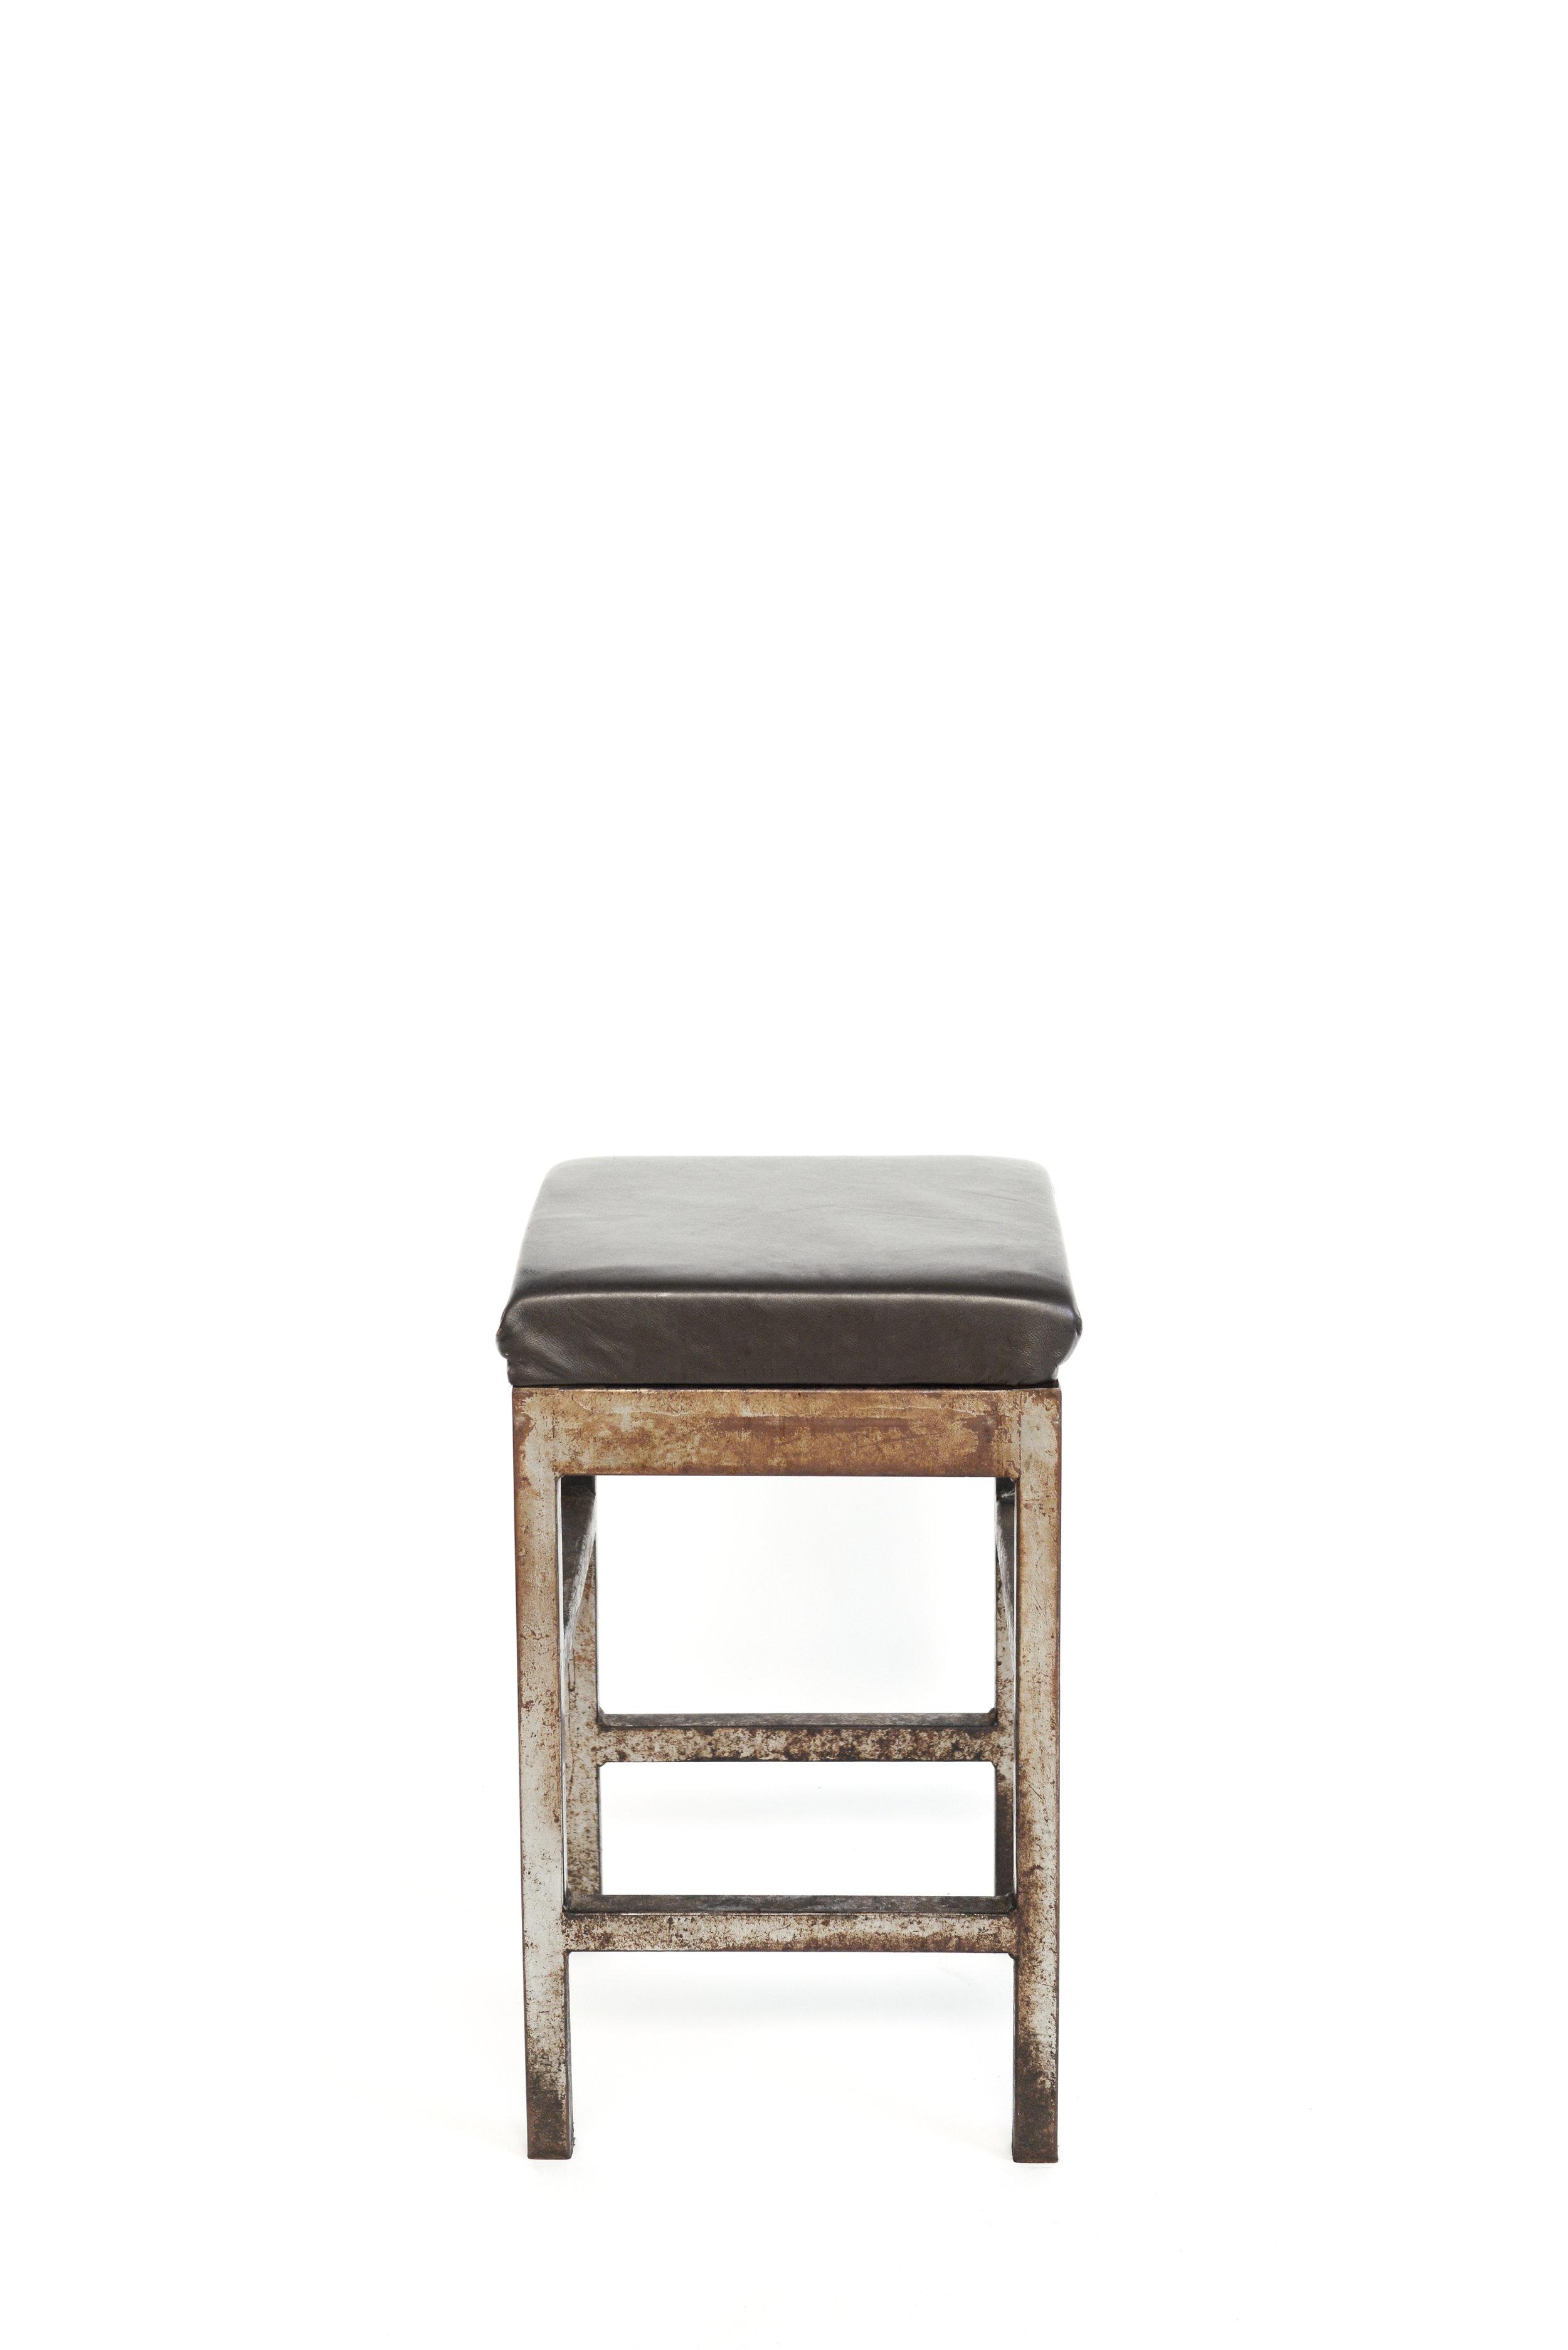 holocene_furniture-15.jpg